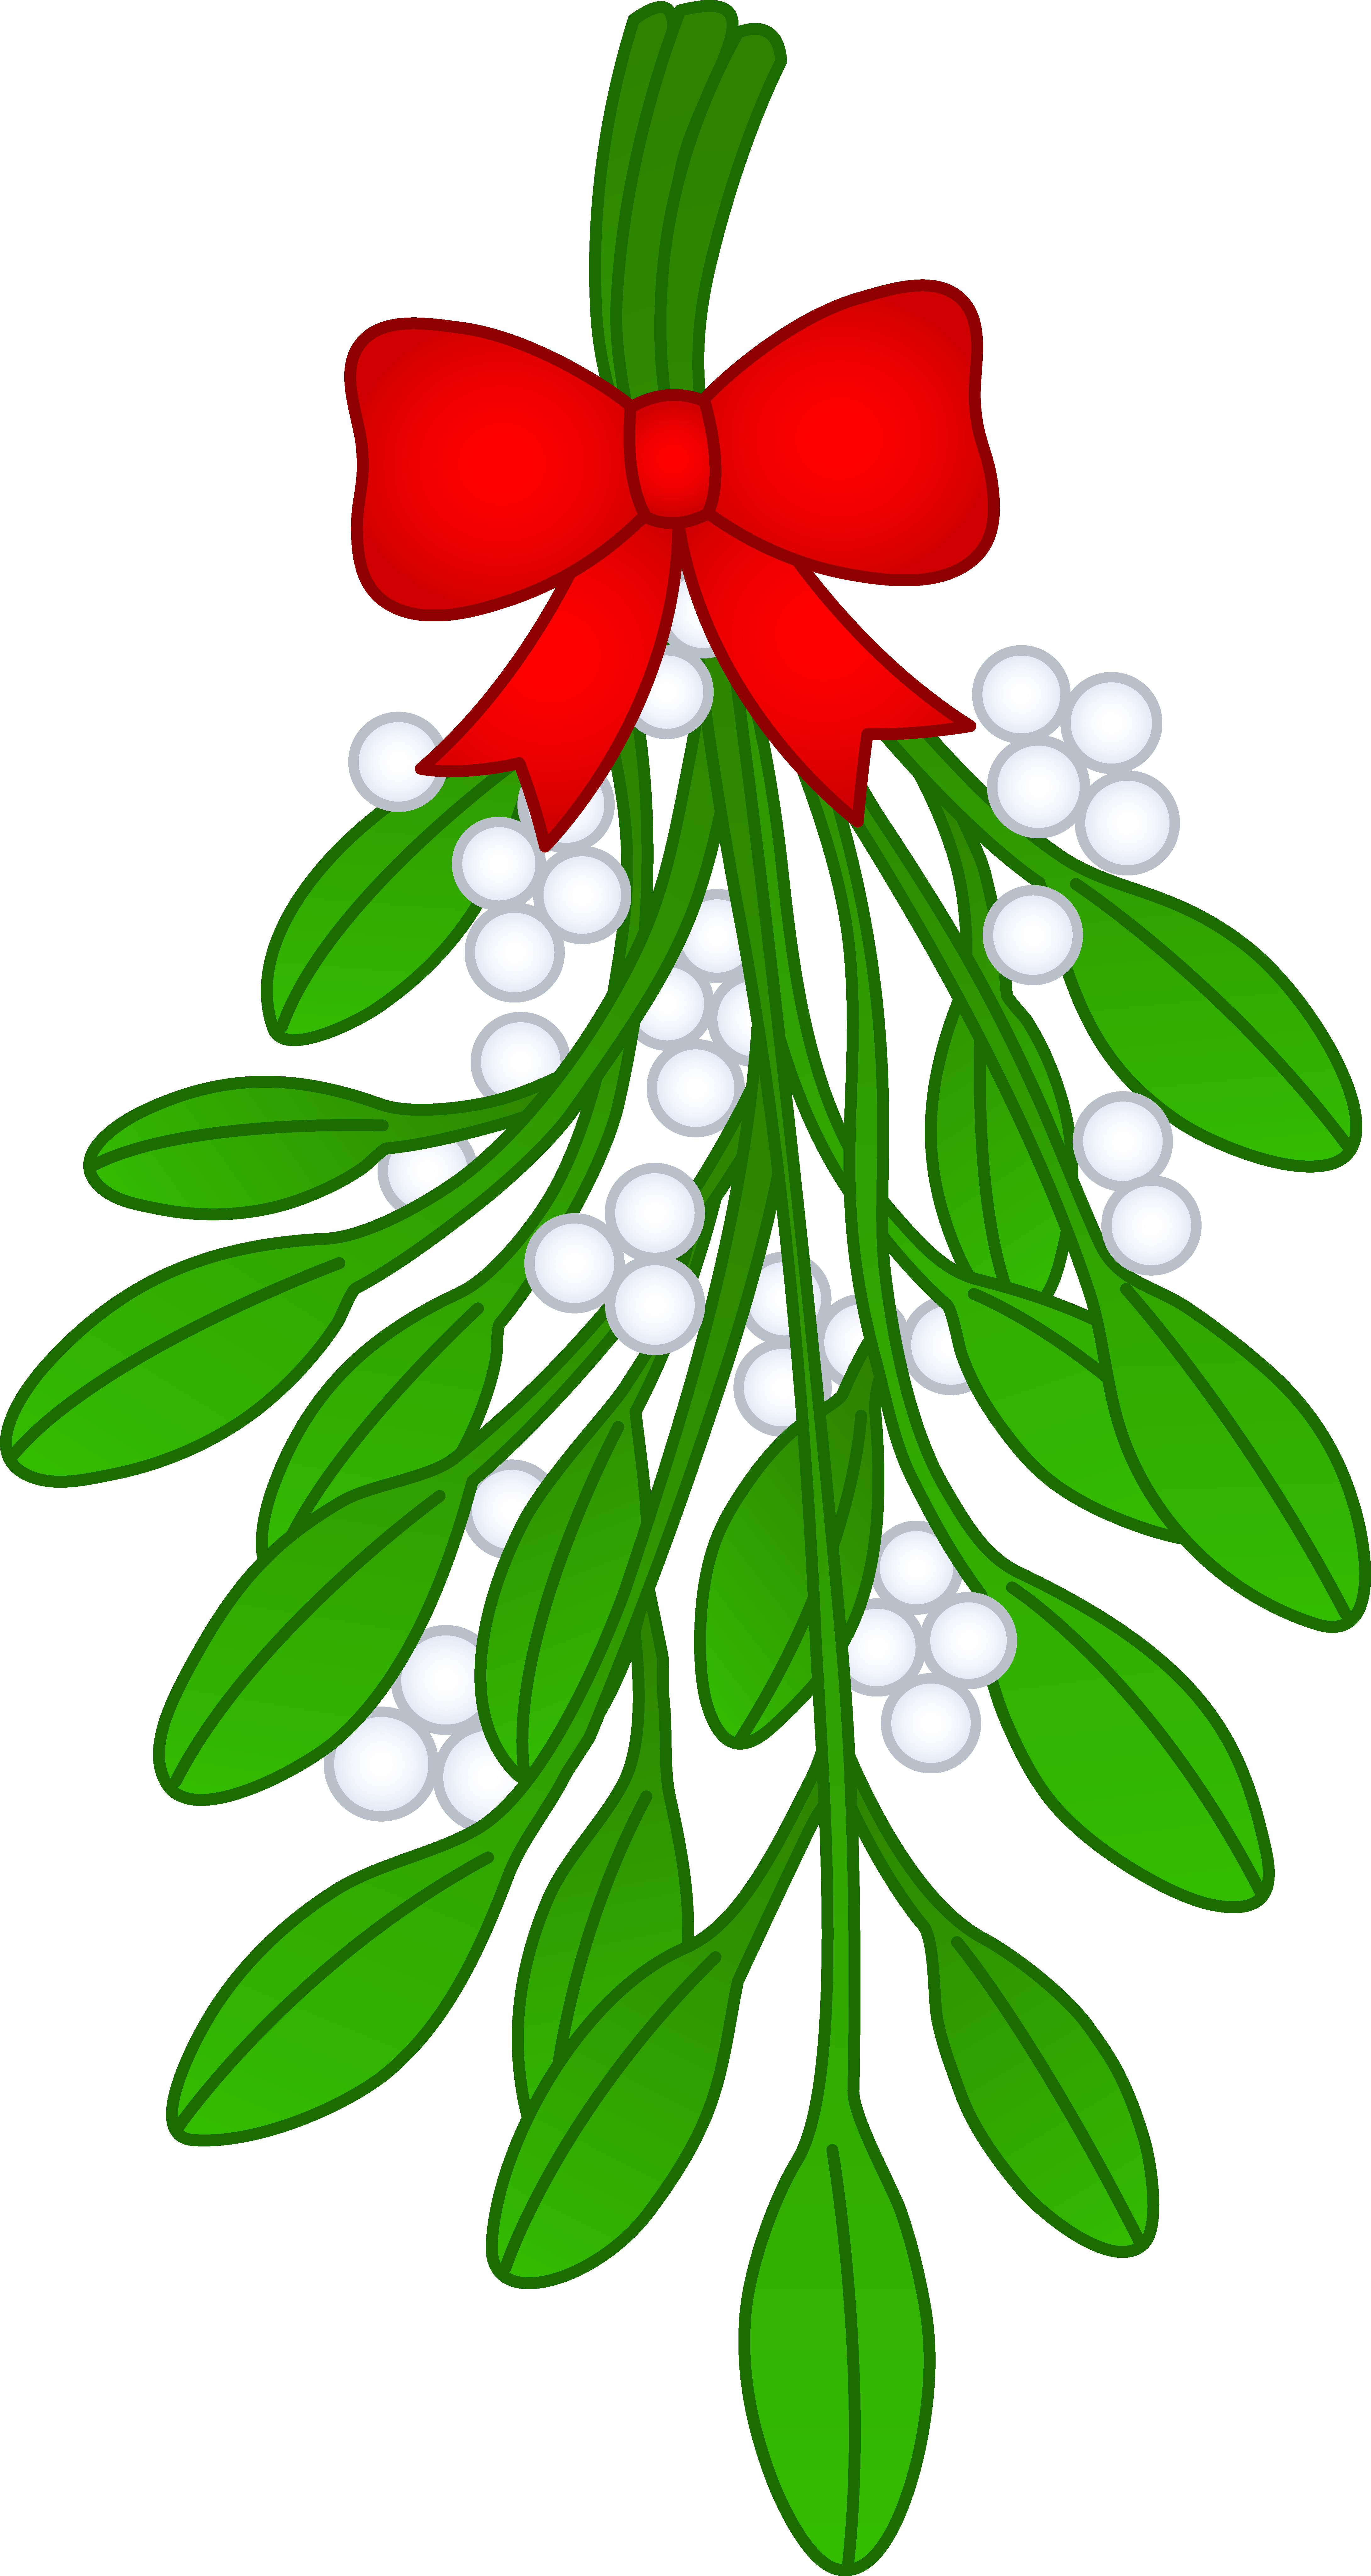 graphic transparent download Mistletoe clipart. Free cliparts download clip